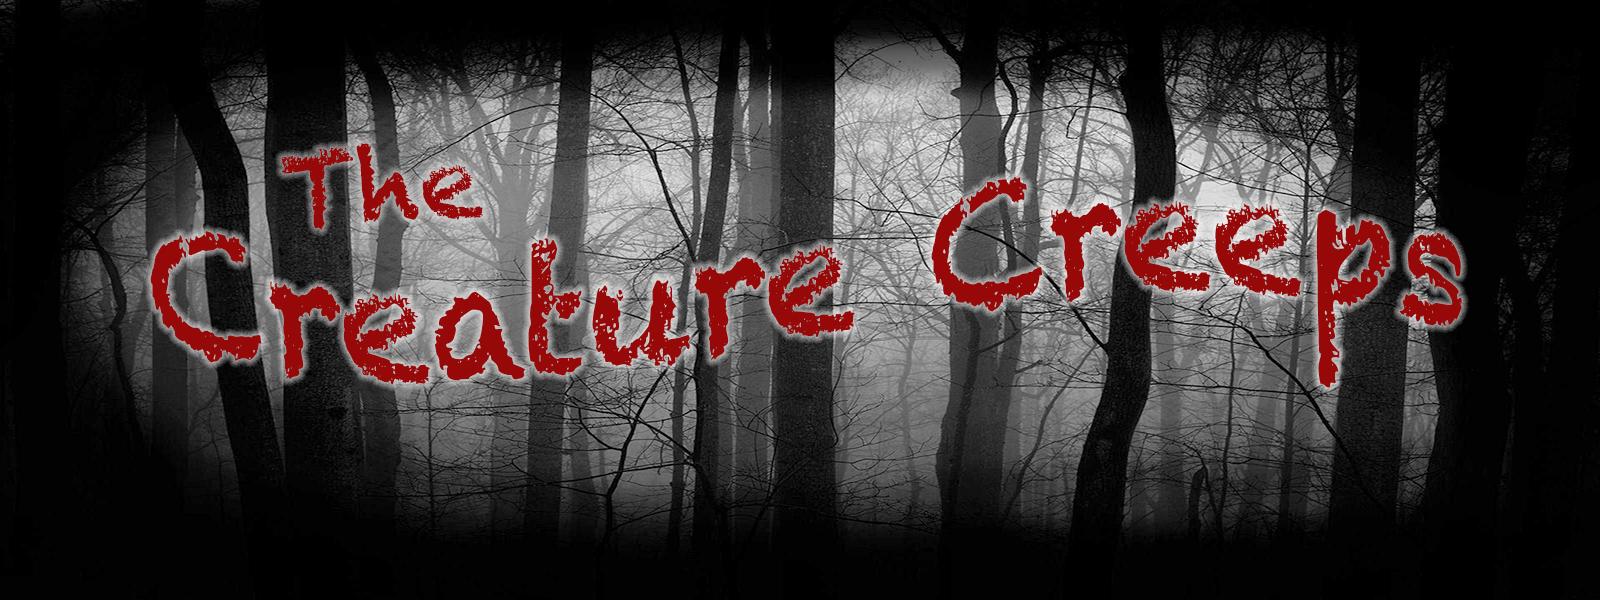 CreatureCreeps Preview Banner.jpg